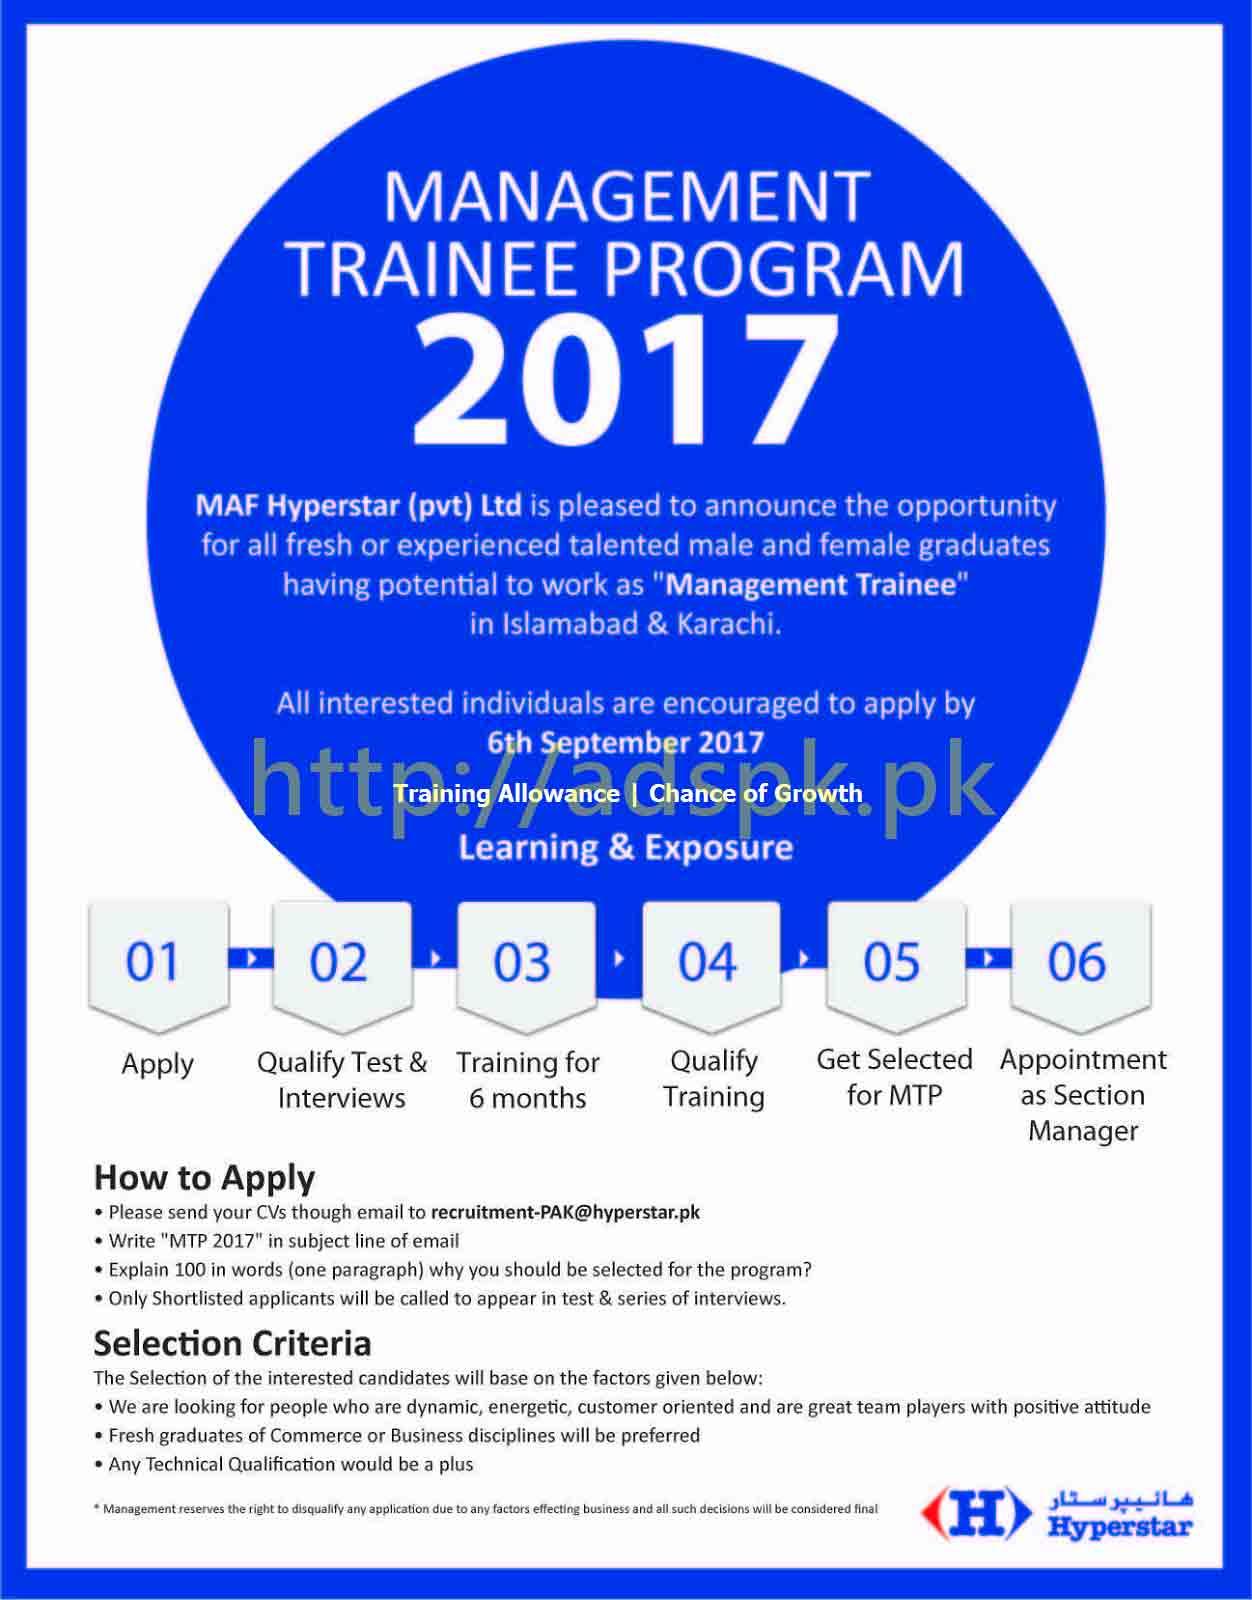 Hyperstar Management Trainee Program 2017 Jobs Islamabad Karachi Jobs Eligibility Fresh Graduates Commerce Business Disciplines Jobs Application Deadline 06-09-2017 Apply Online Now